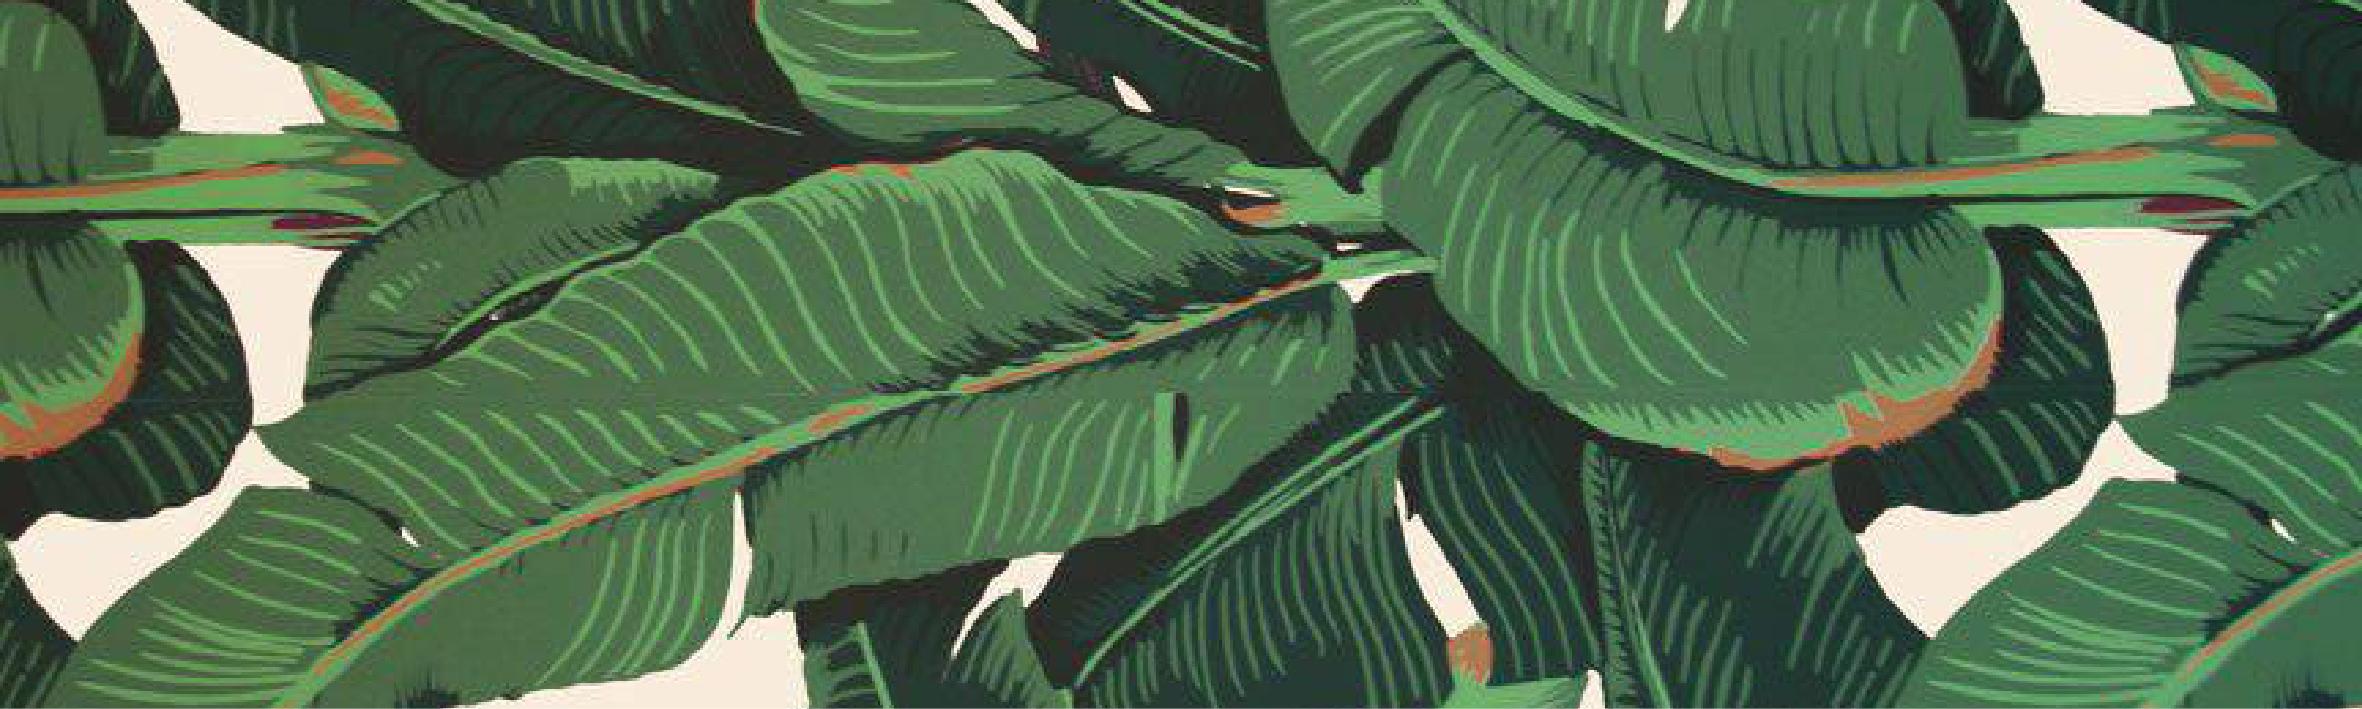 Free Download Displaying 17 Images For Banana Leaf Wallpaper Bathroom 2362x709 For Your Desktop Mobile Tablet Explore 49 Banana Leaves Wallpaper Banana Leaf Wallpaper For Sale Banana Palm Wallpaper Banana Tree Wallpaper Summer and spring design element. banana leaves wallpaper